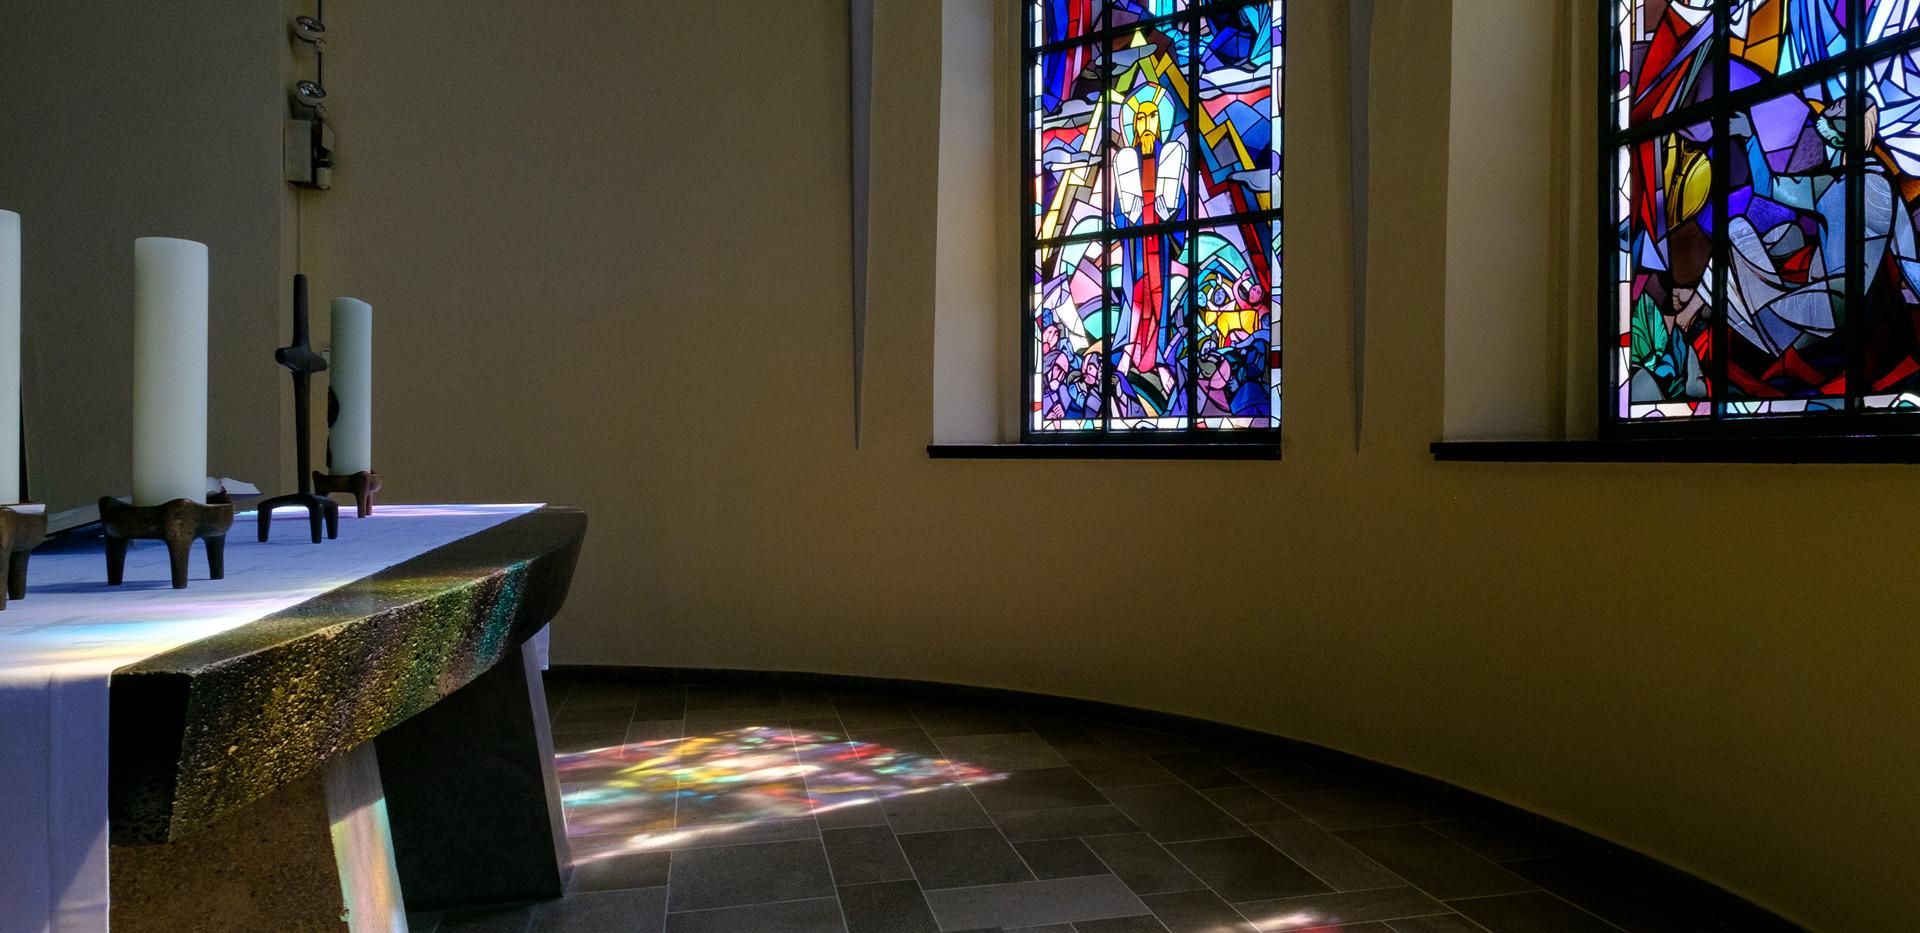 Evangelische Kirche Bad Honnef 18.jpg